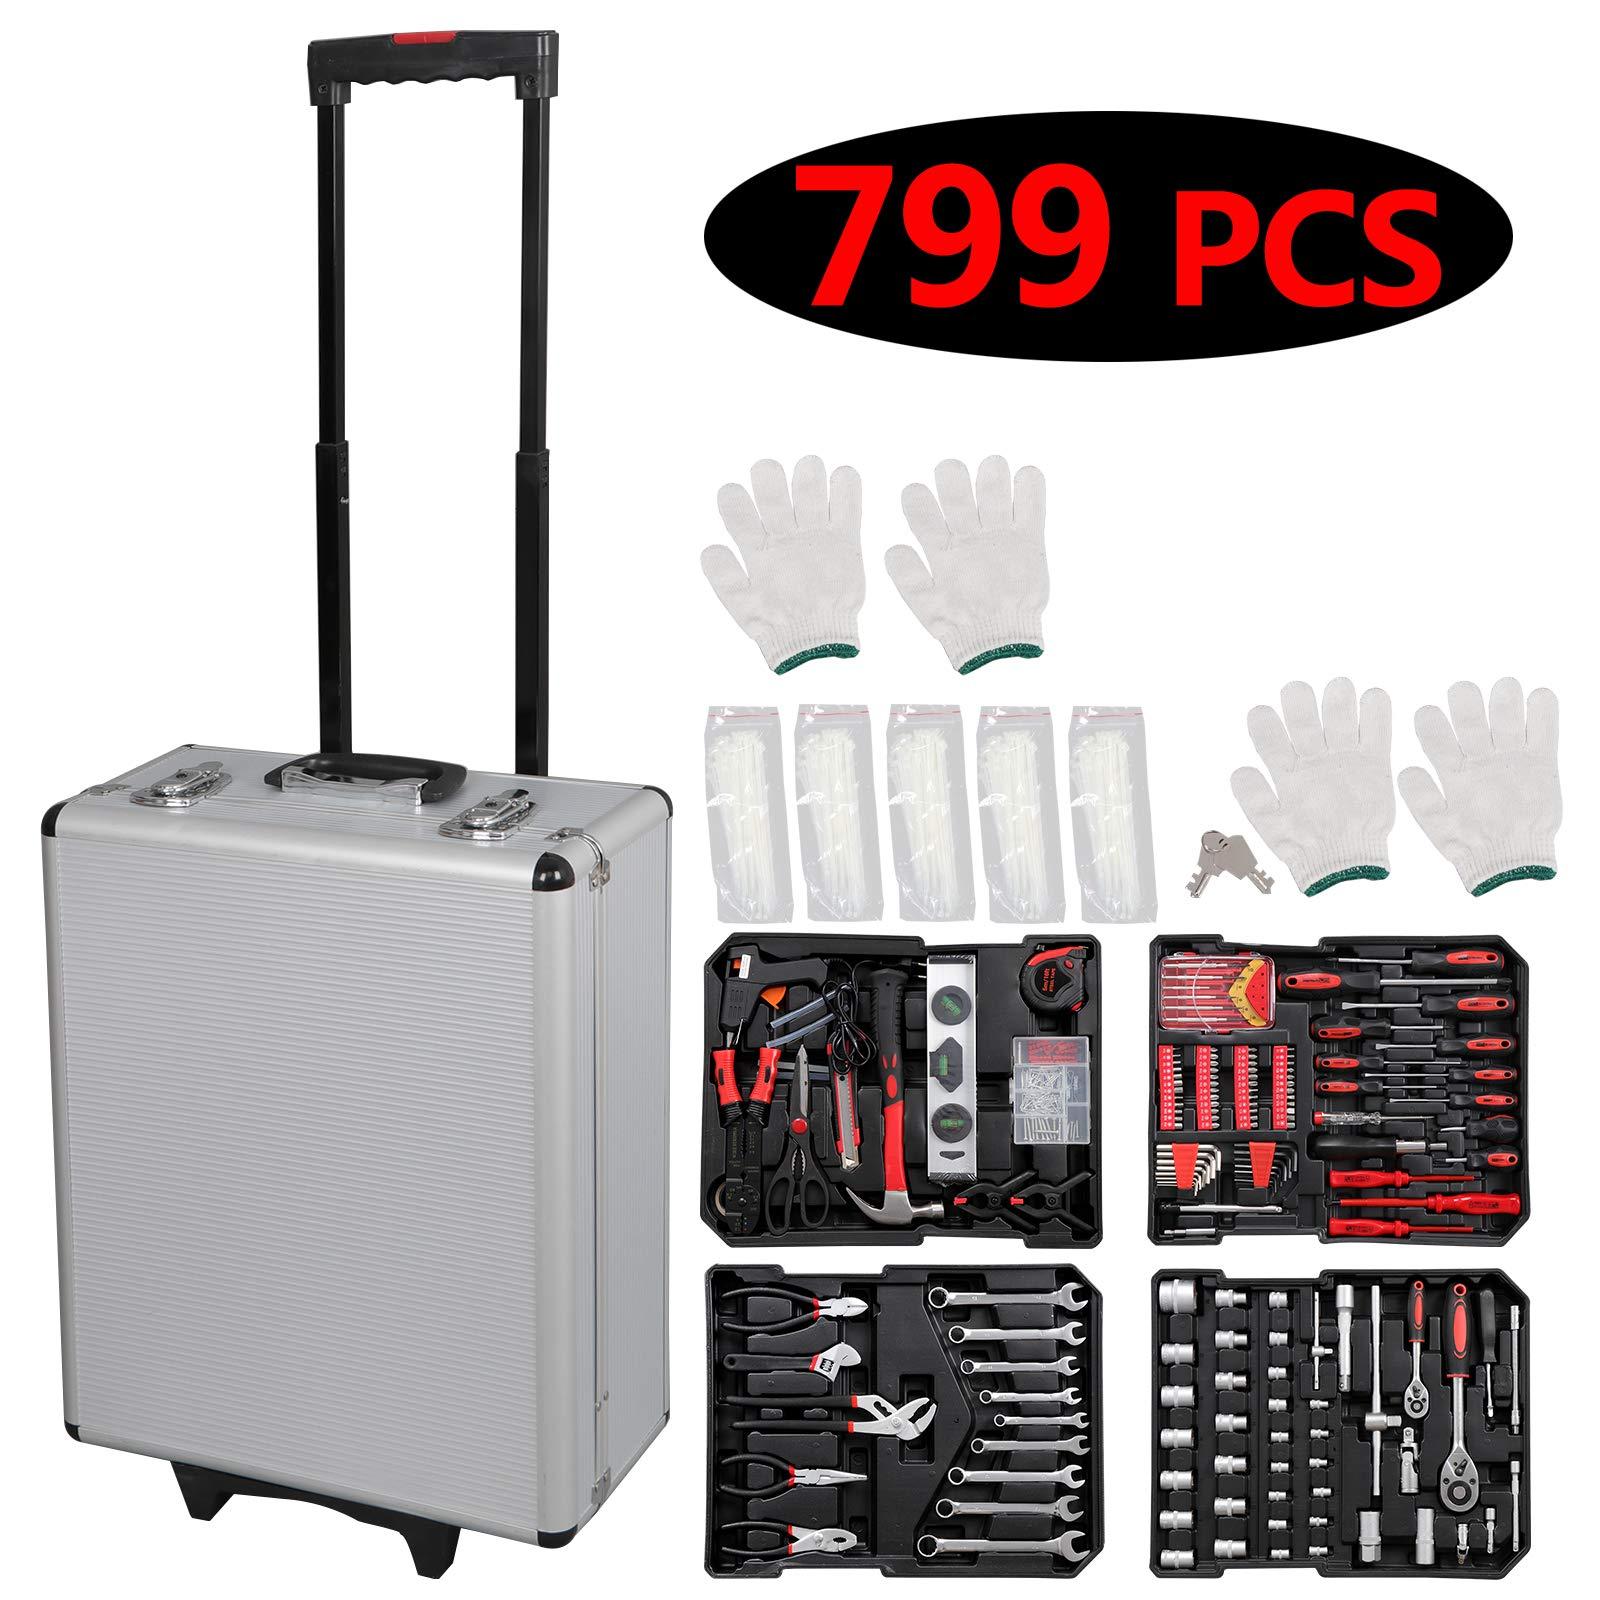 Smartxchoices 799 PCS Hand Tool Mechanics Kit Bundle Wrench Socket Toolbox with Aluminium Case Trolley Home DIY Repair Screwdrivers